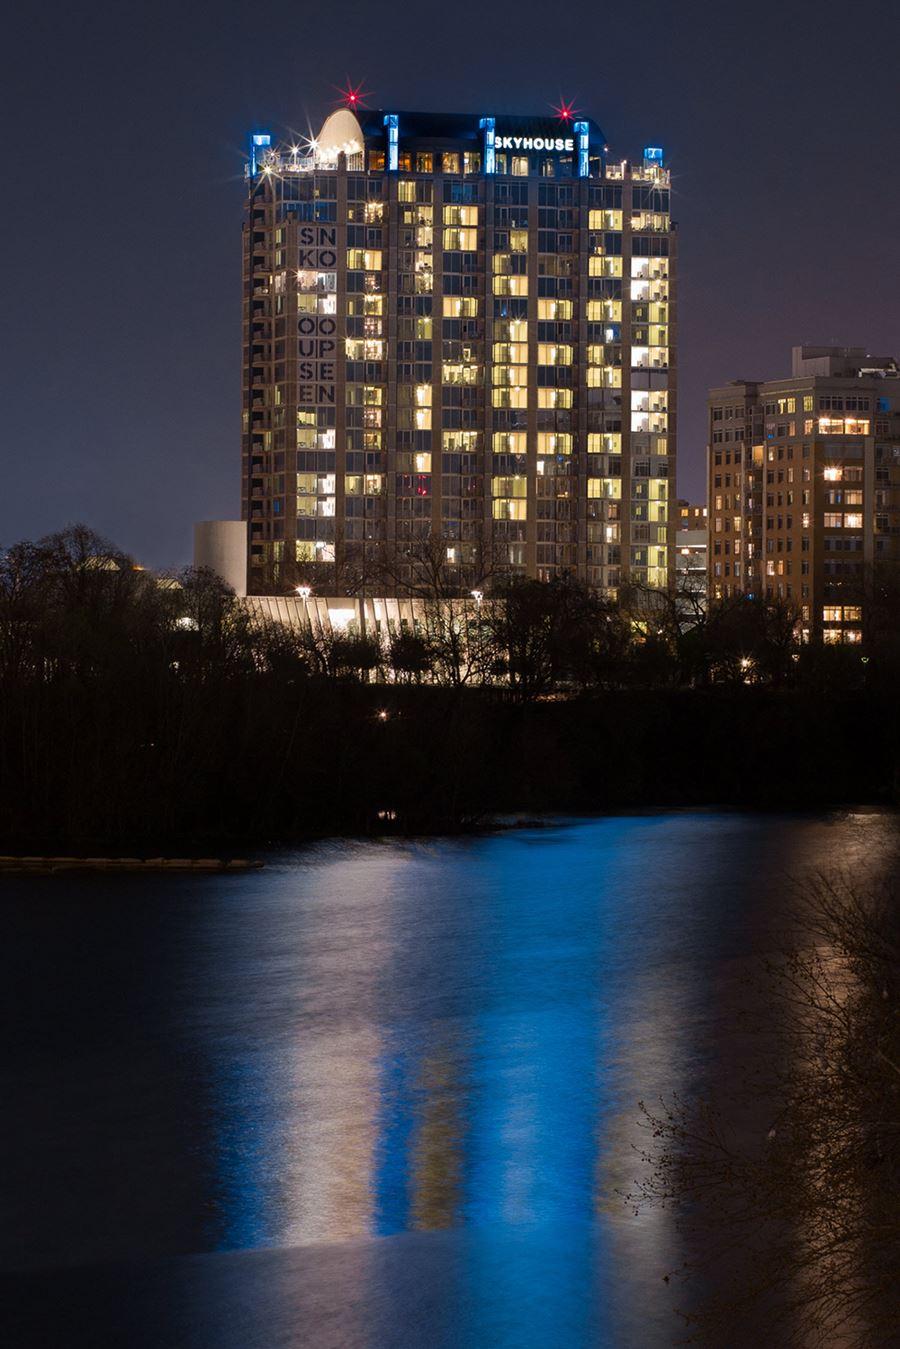 Austin Tx Apartments Downtown Skyhouse Austin Gallery Math Wallpaper Golden Find Free HD for Desktop [pastnedes.tk]